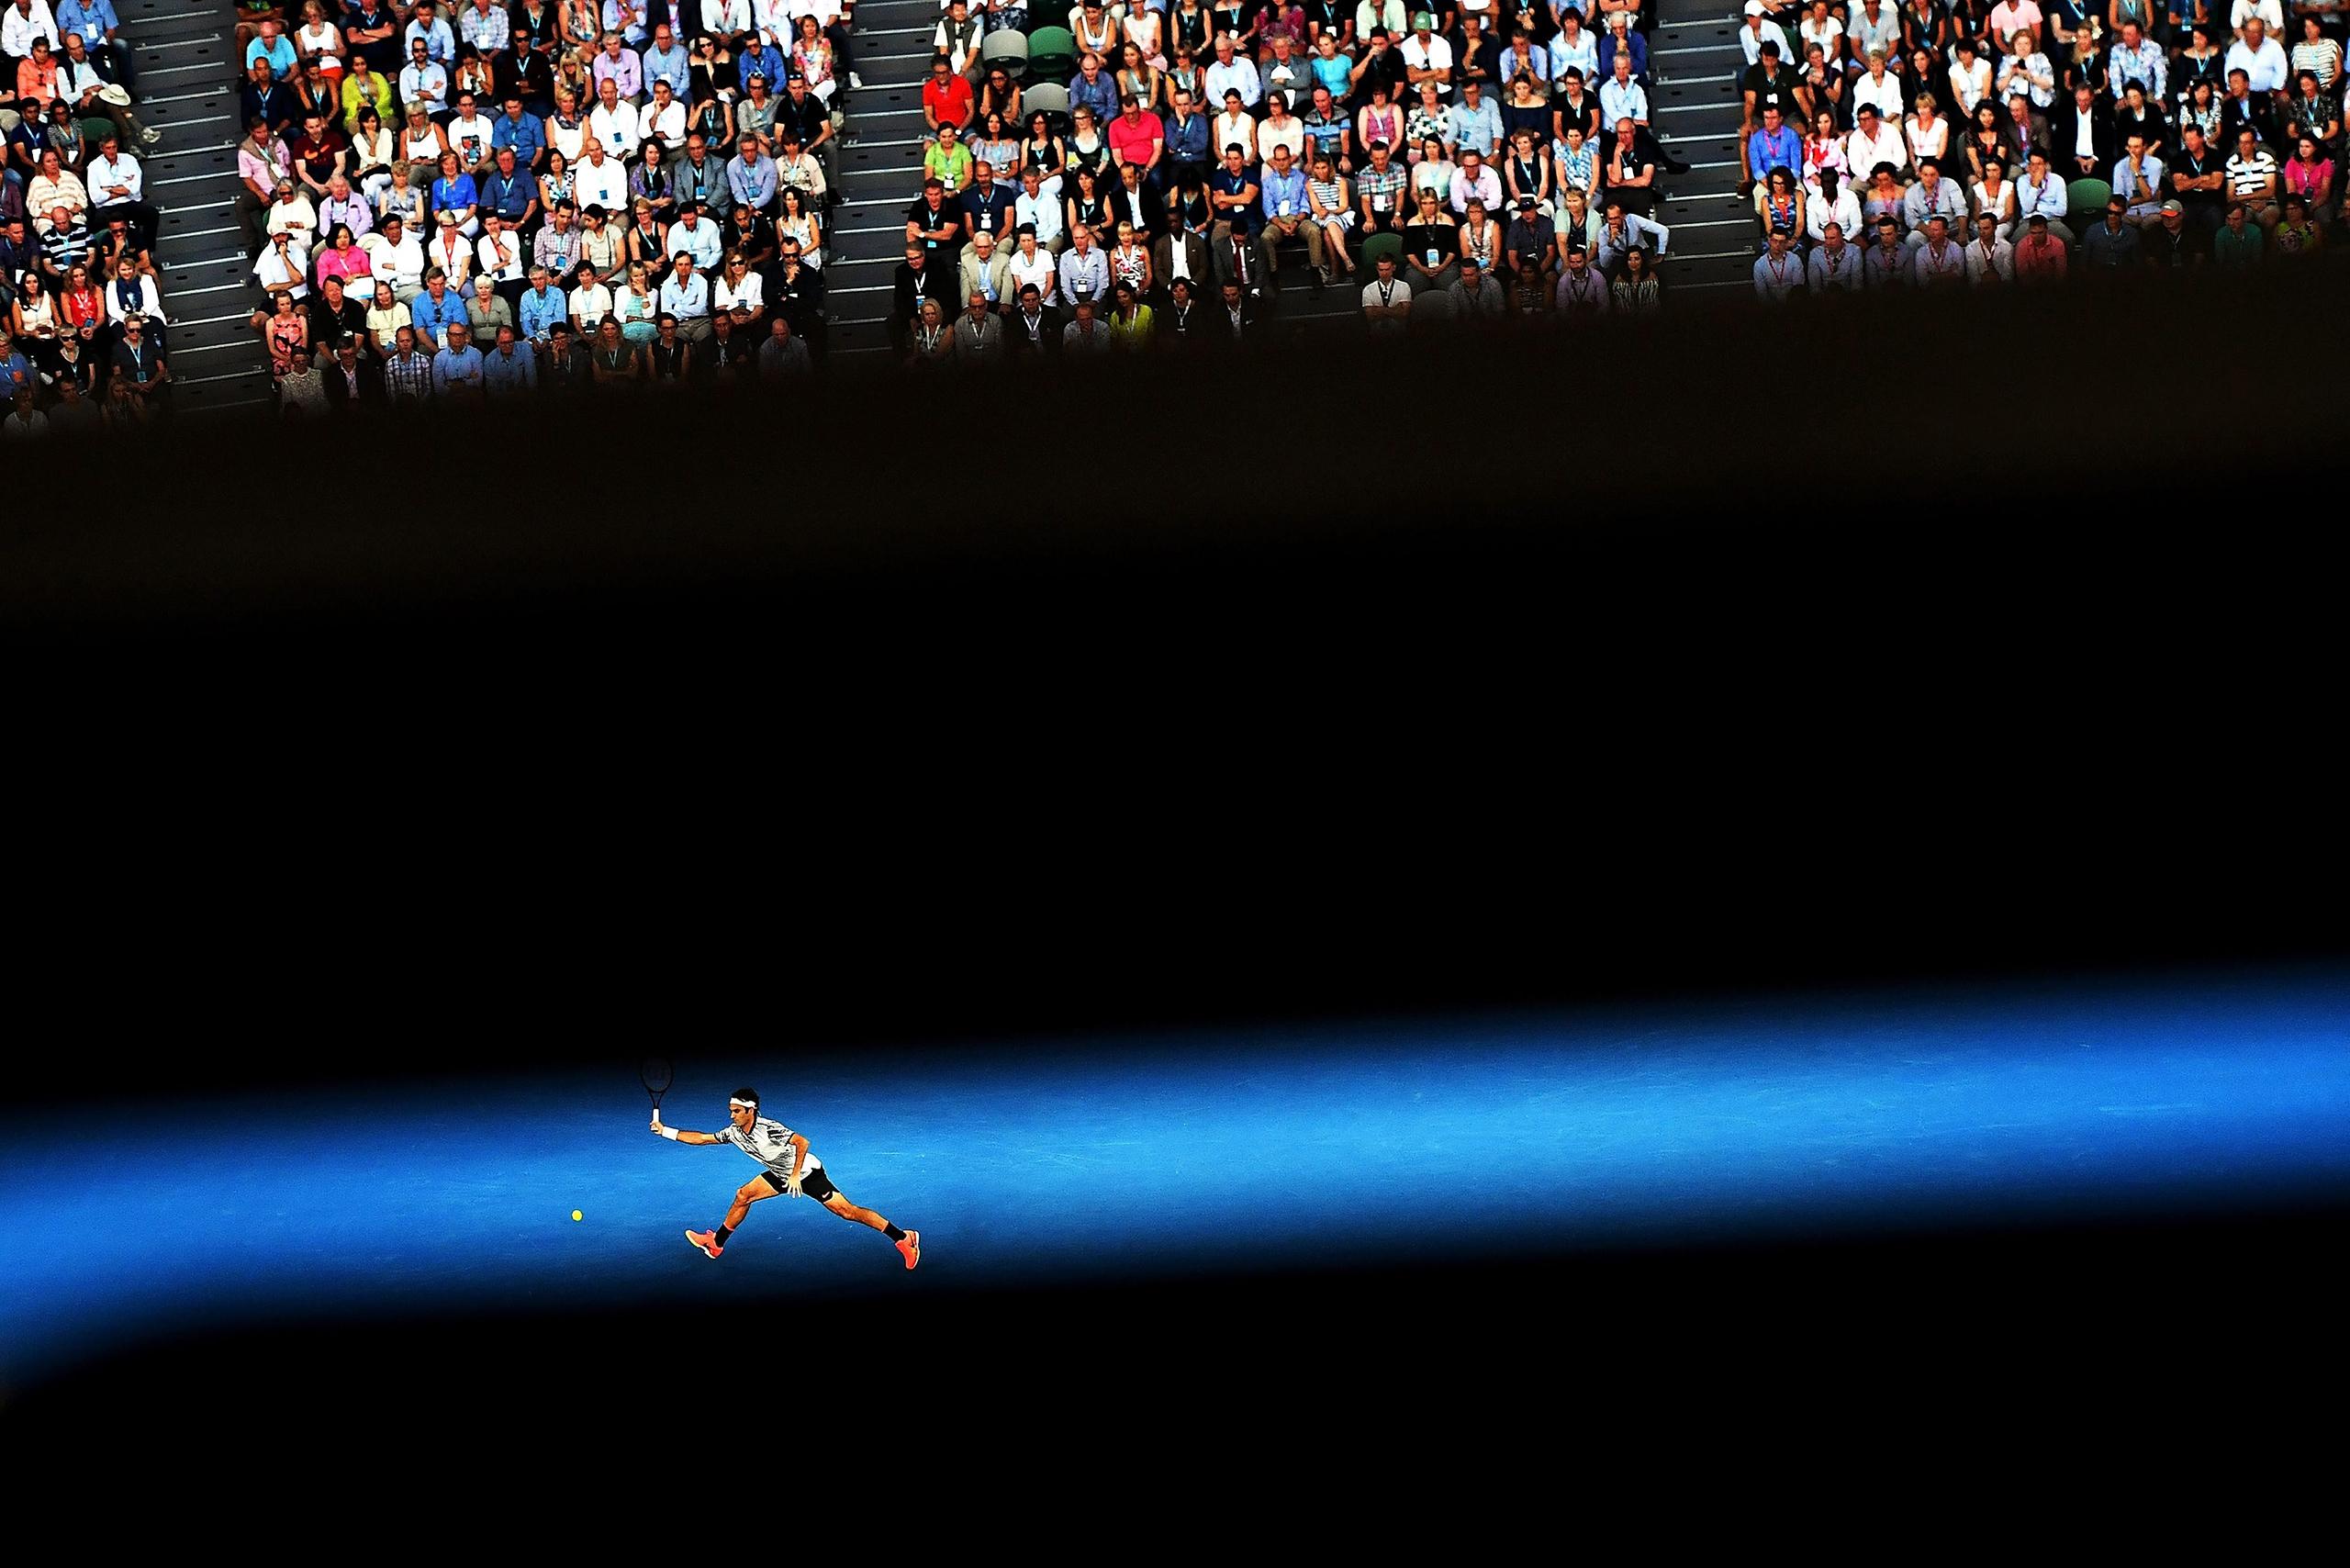 Federer outlasted longtime rival Rafael Nadal in five grueling sets to win the Australian Open in Melbourne on Jan. 29.